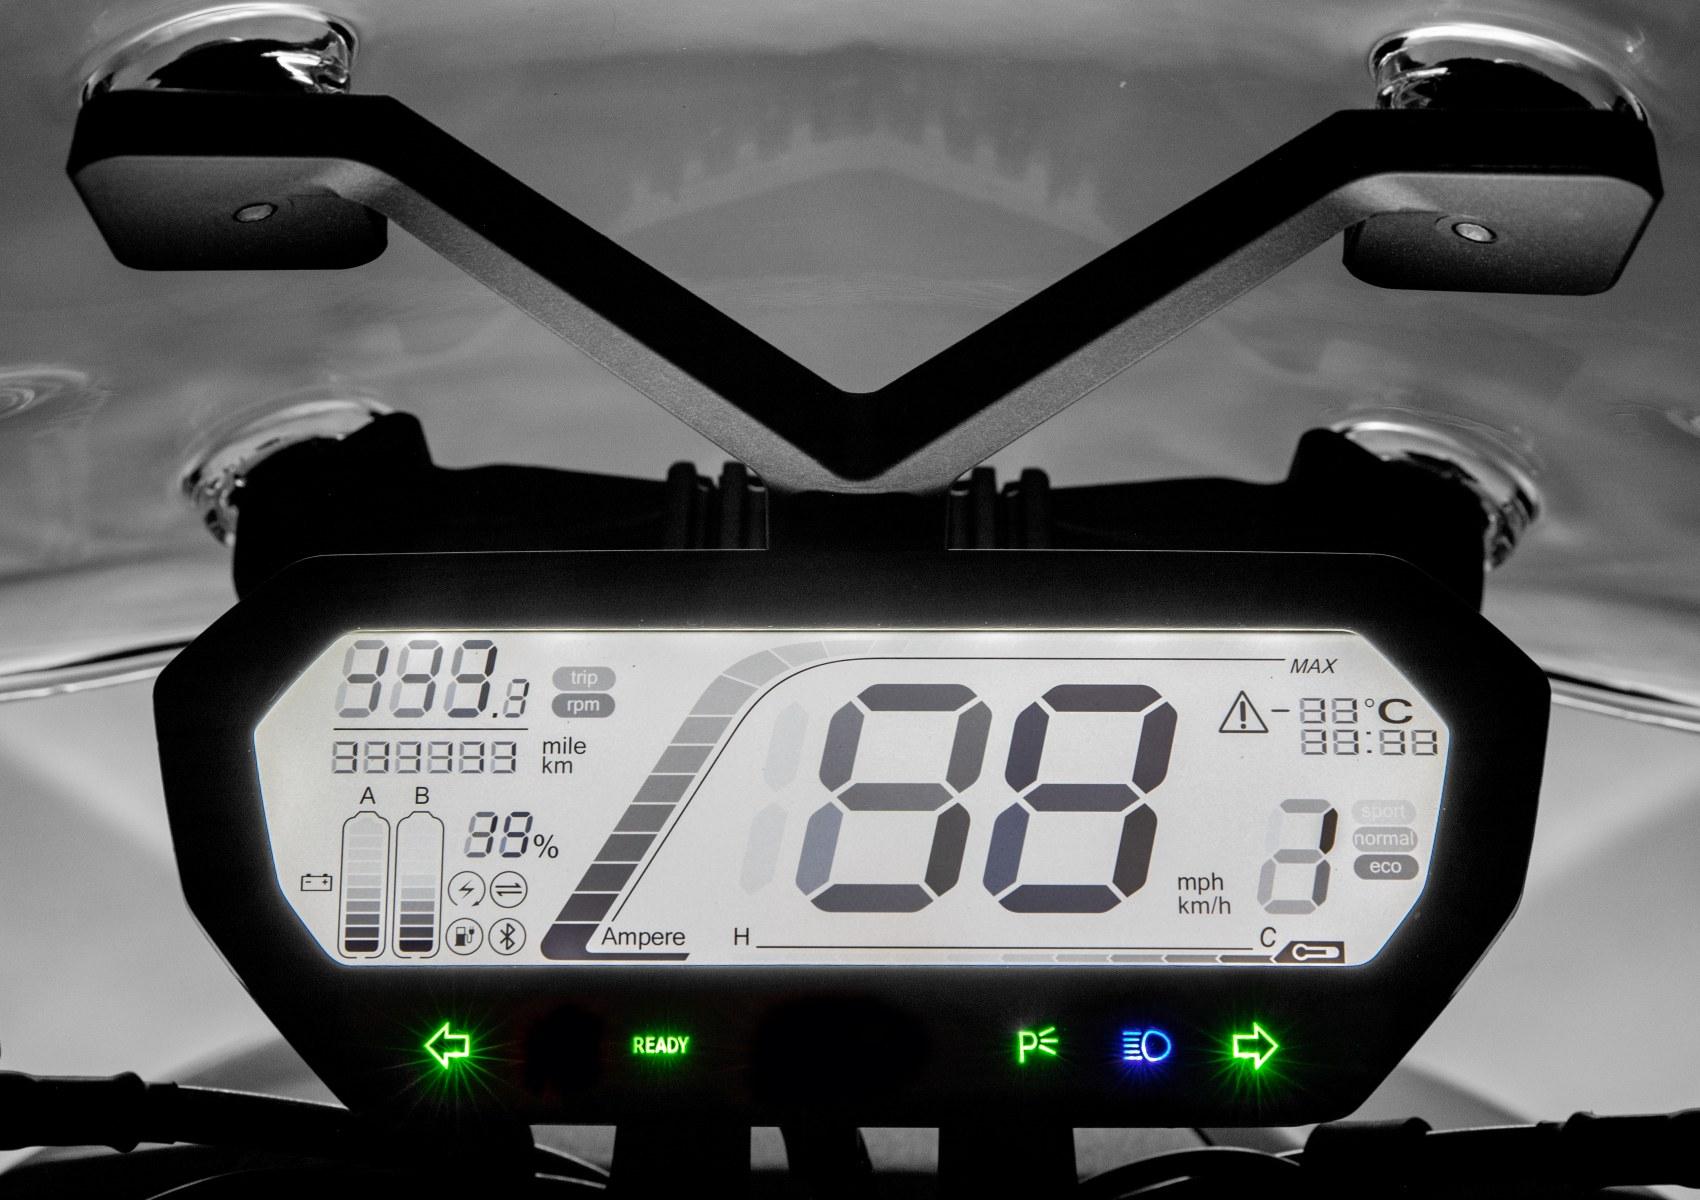 Super Soco CPx electric scooter digital dash display unit